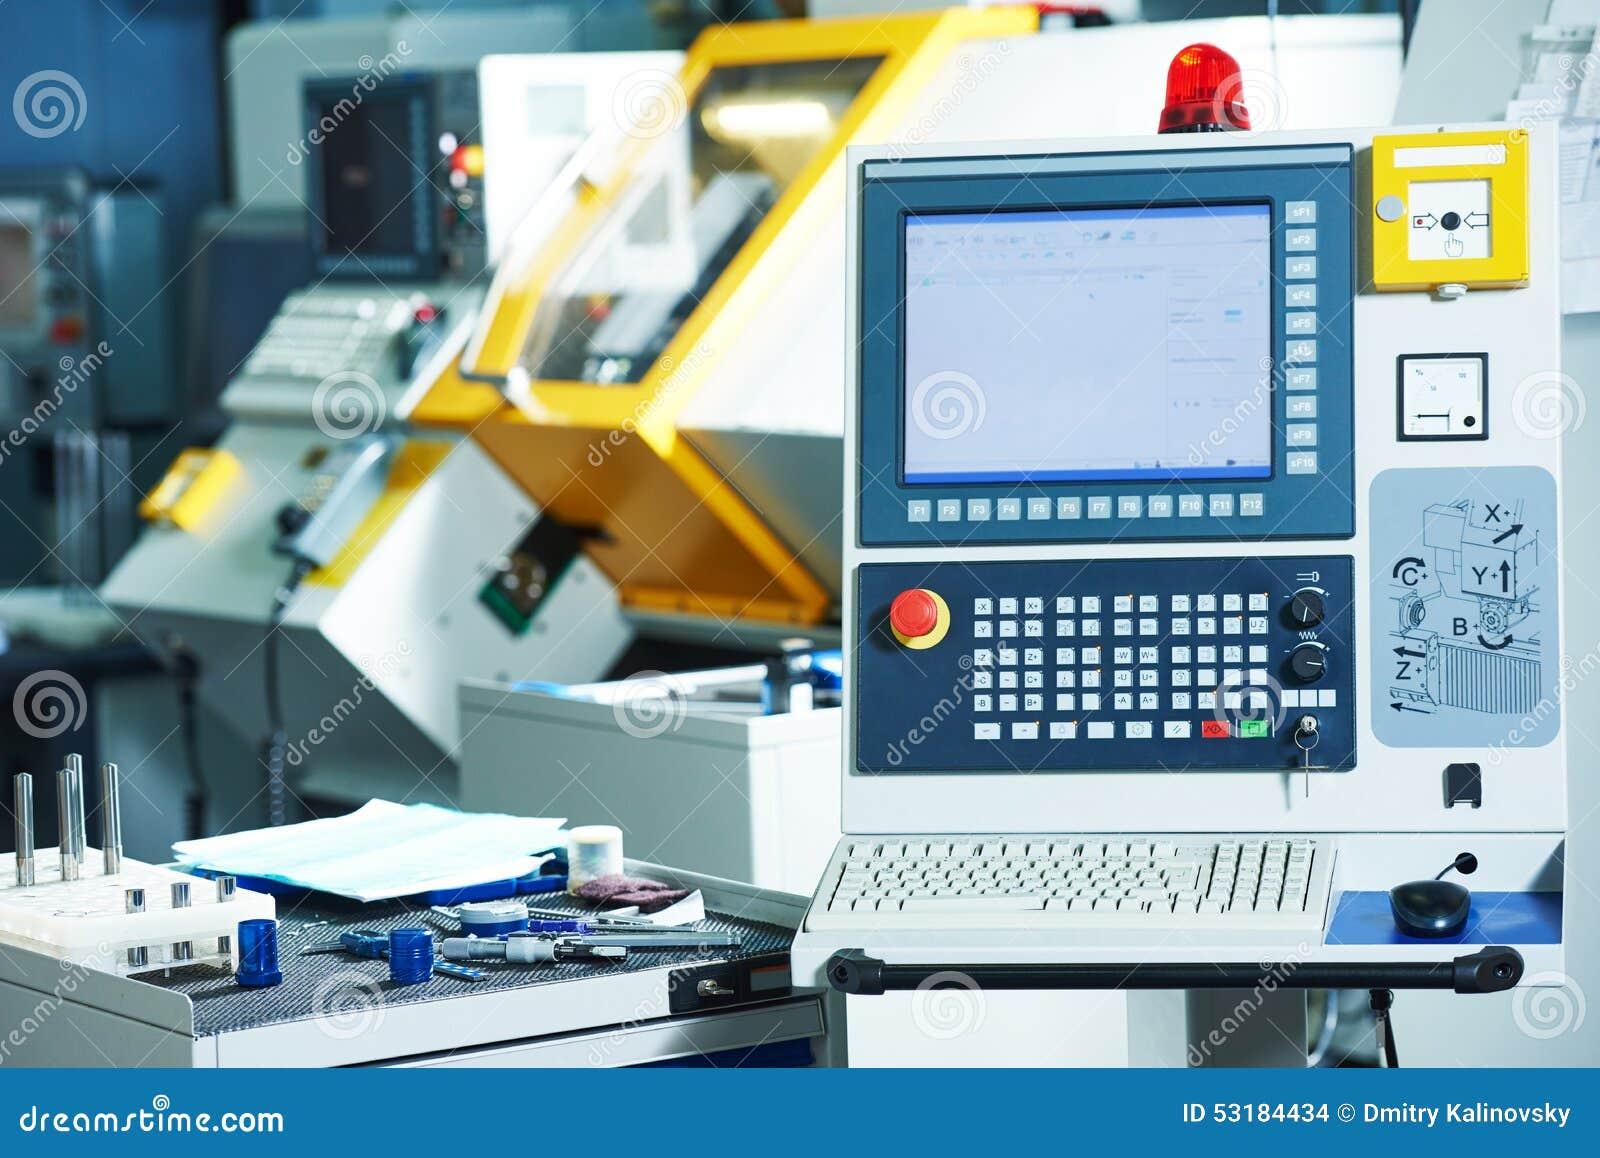 Industrial cnc milling machine center